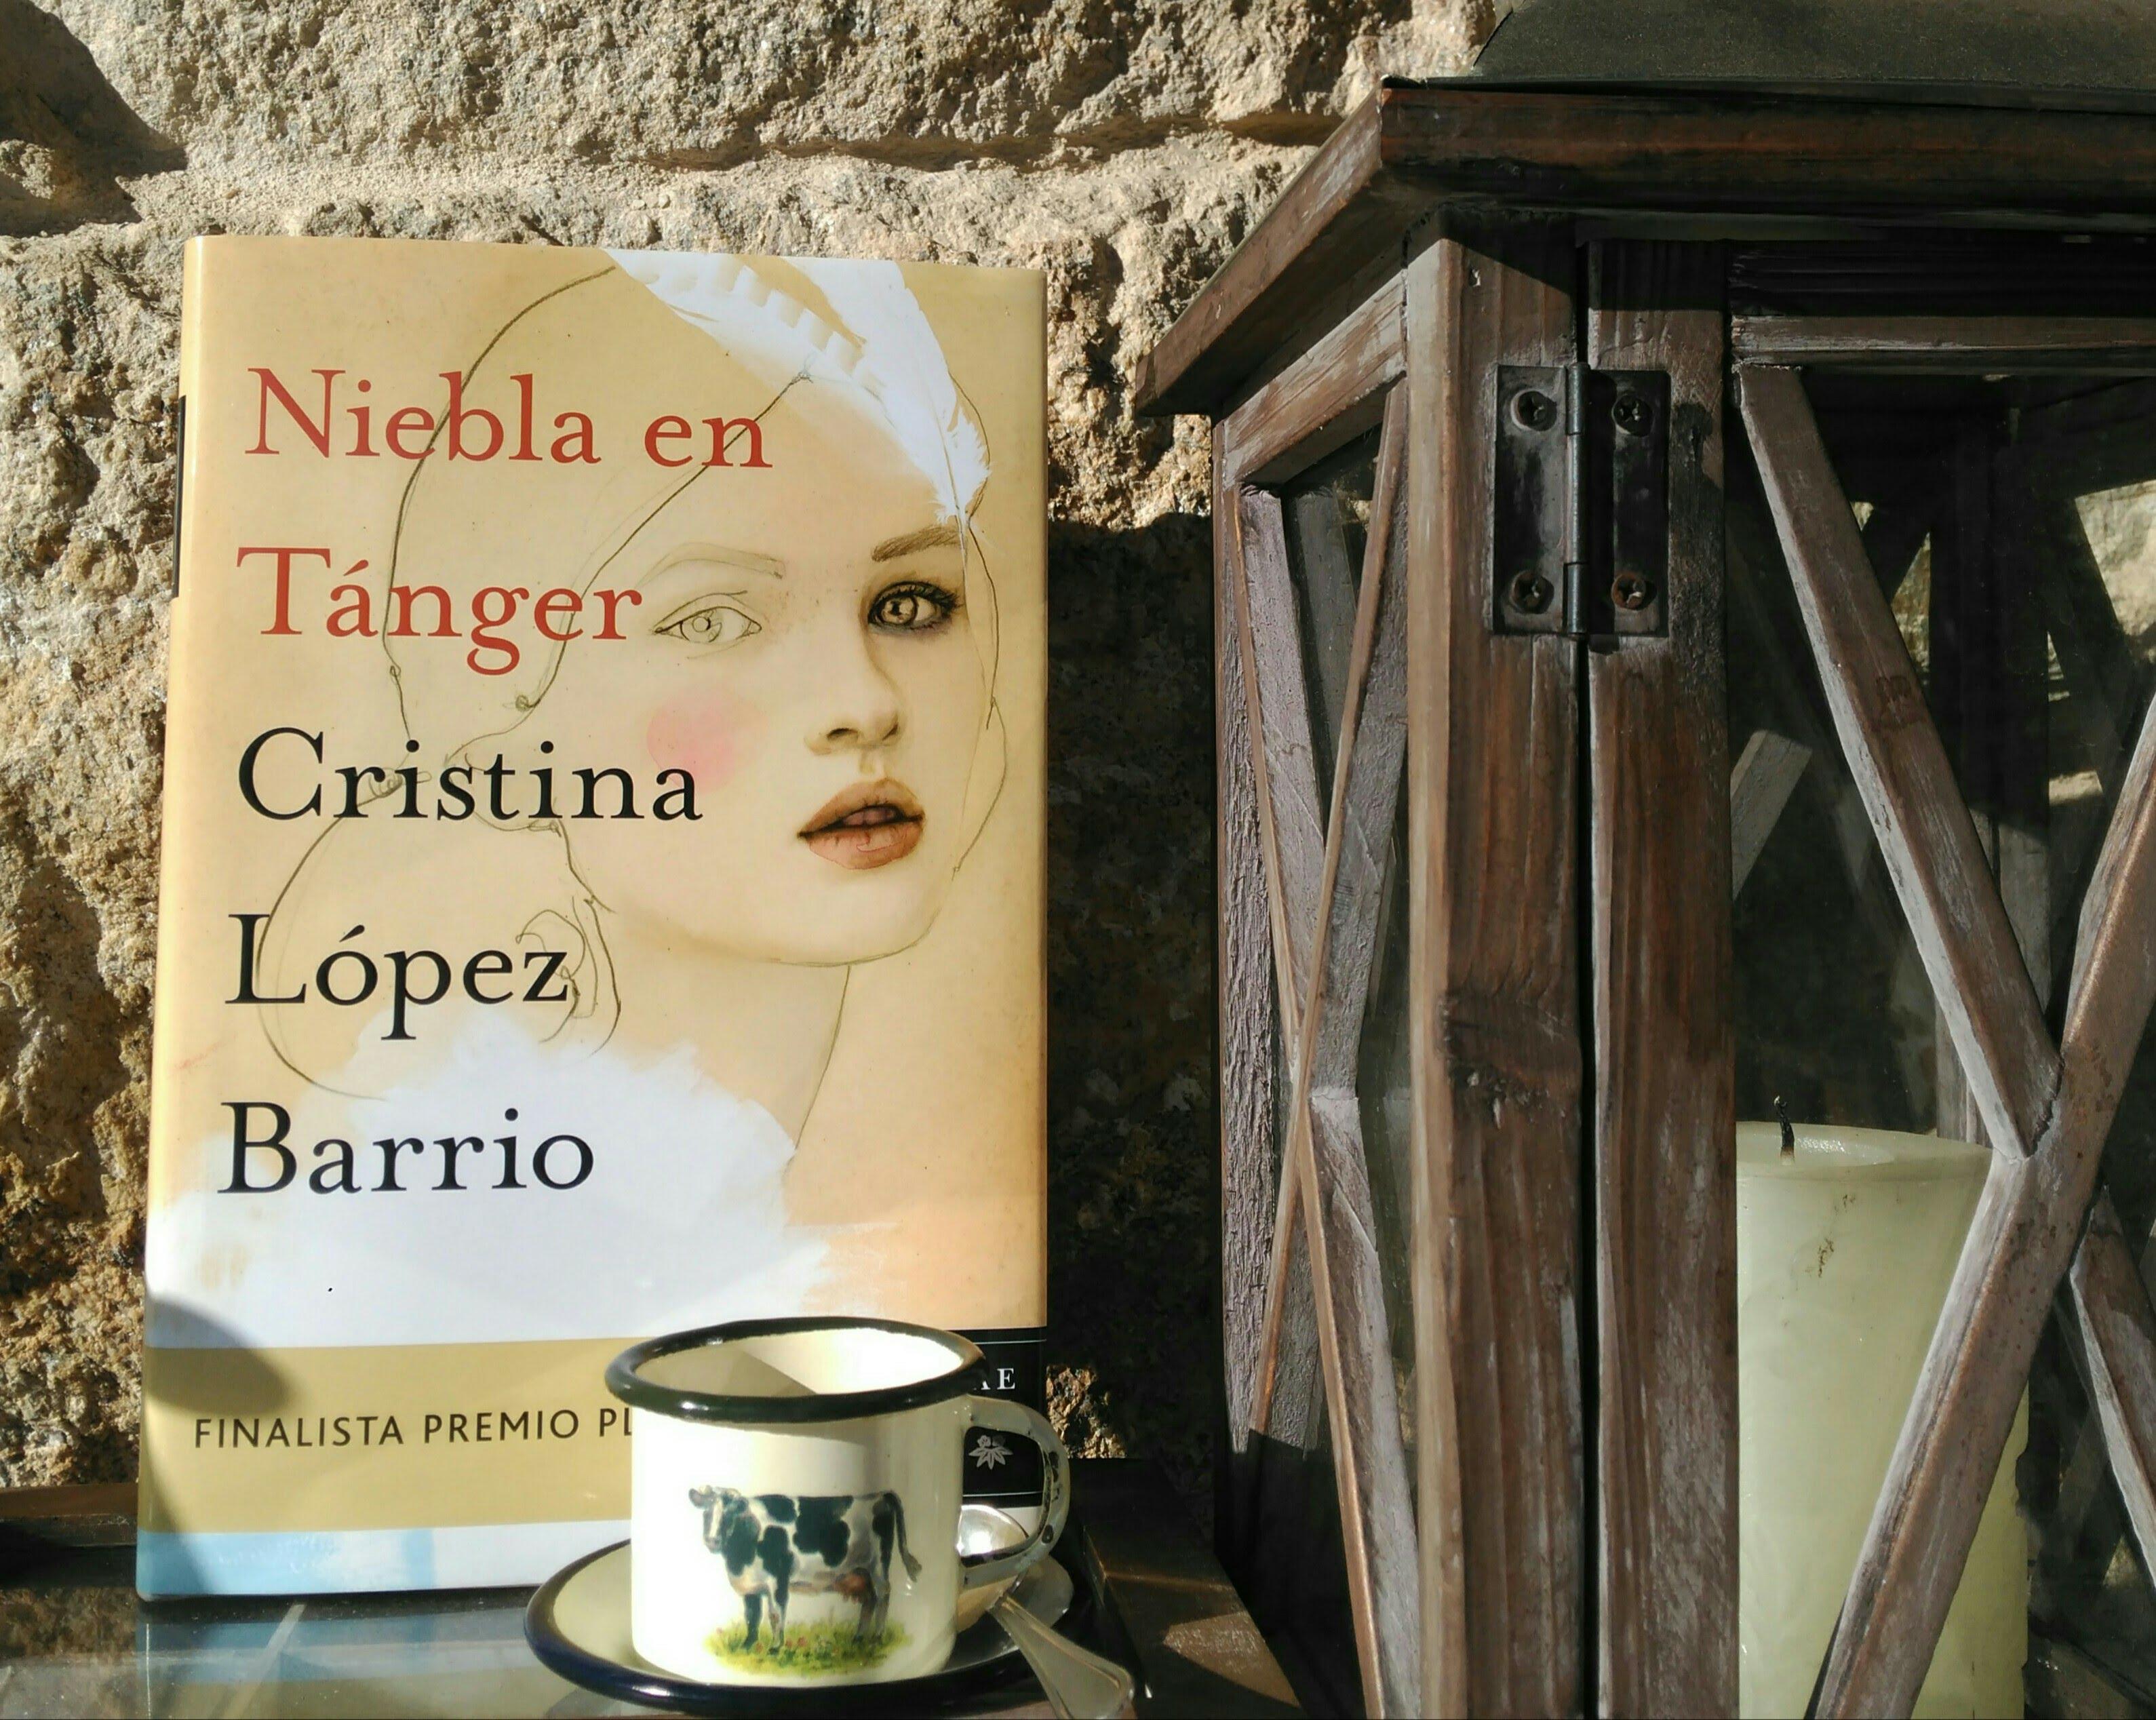 Niebla En Tánger Cristina López Barrio Finalista Premio Planeta 2017